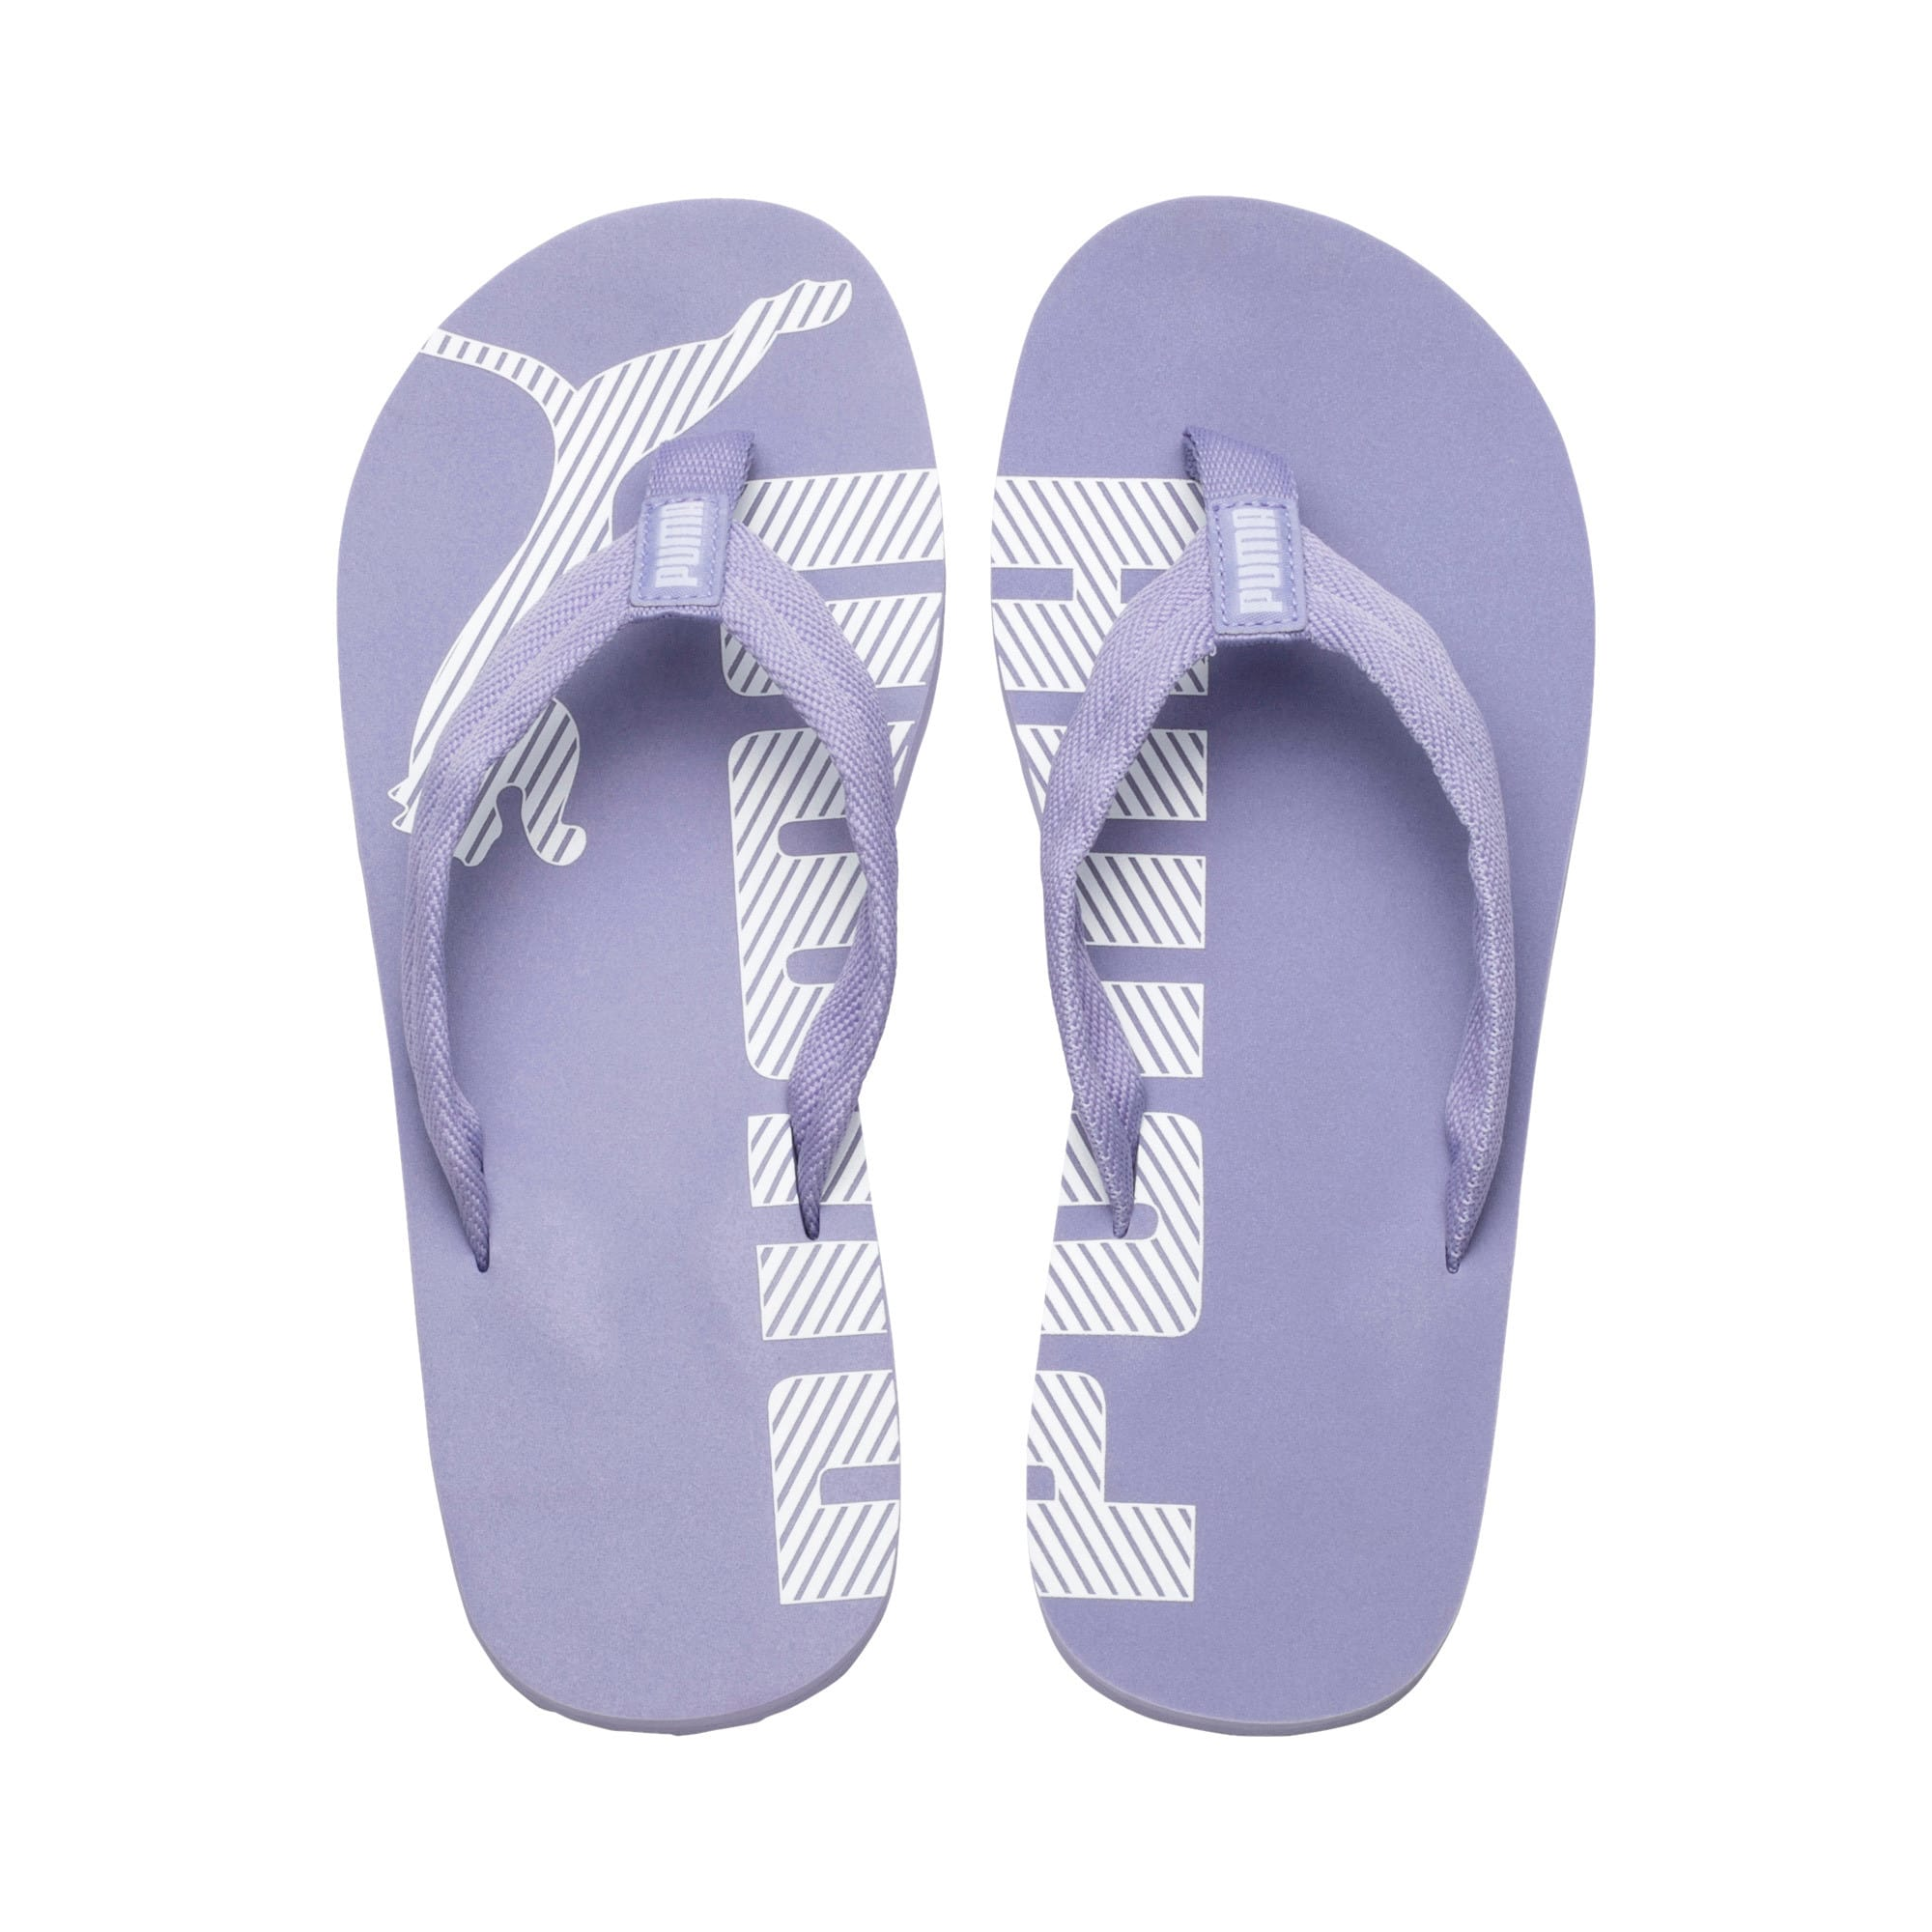 Thumbnail 6 of エピック フリップ V2 サンダル, Sweet Lavender-Puma White, medium-JPN